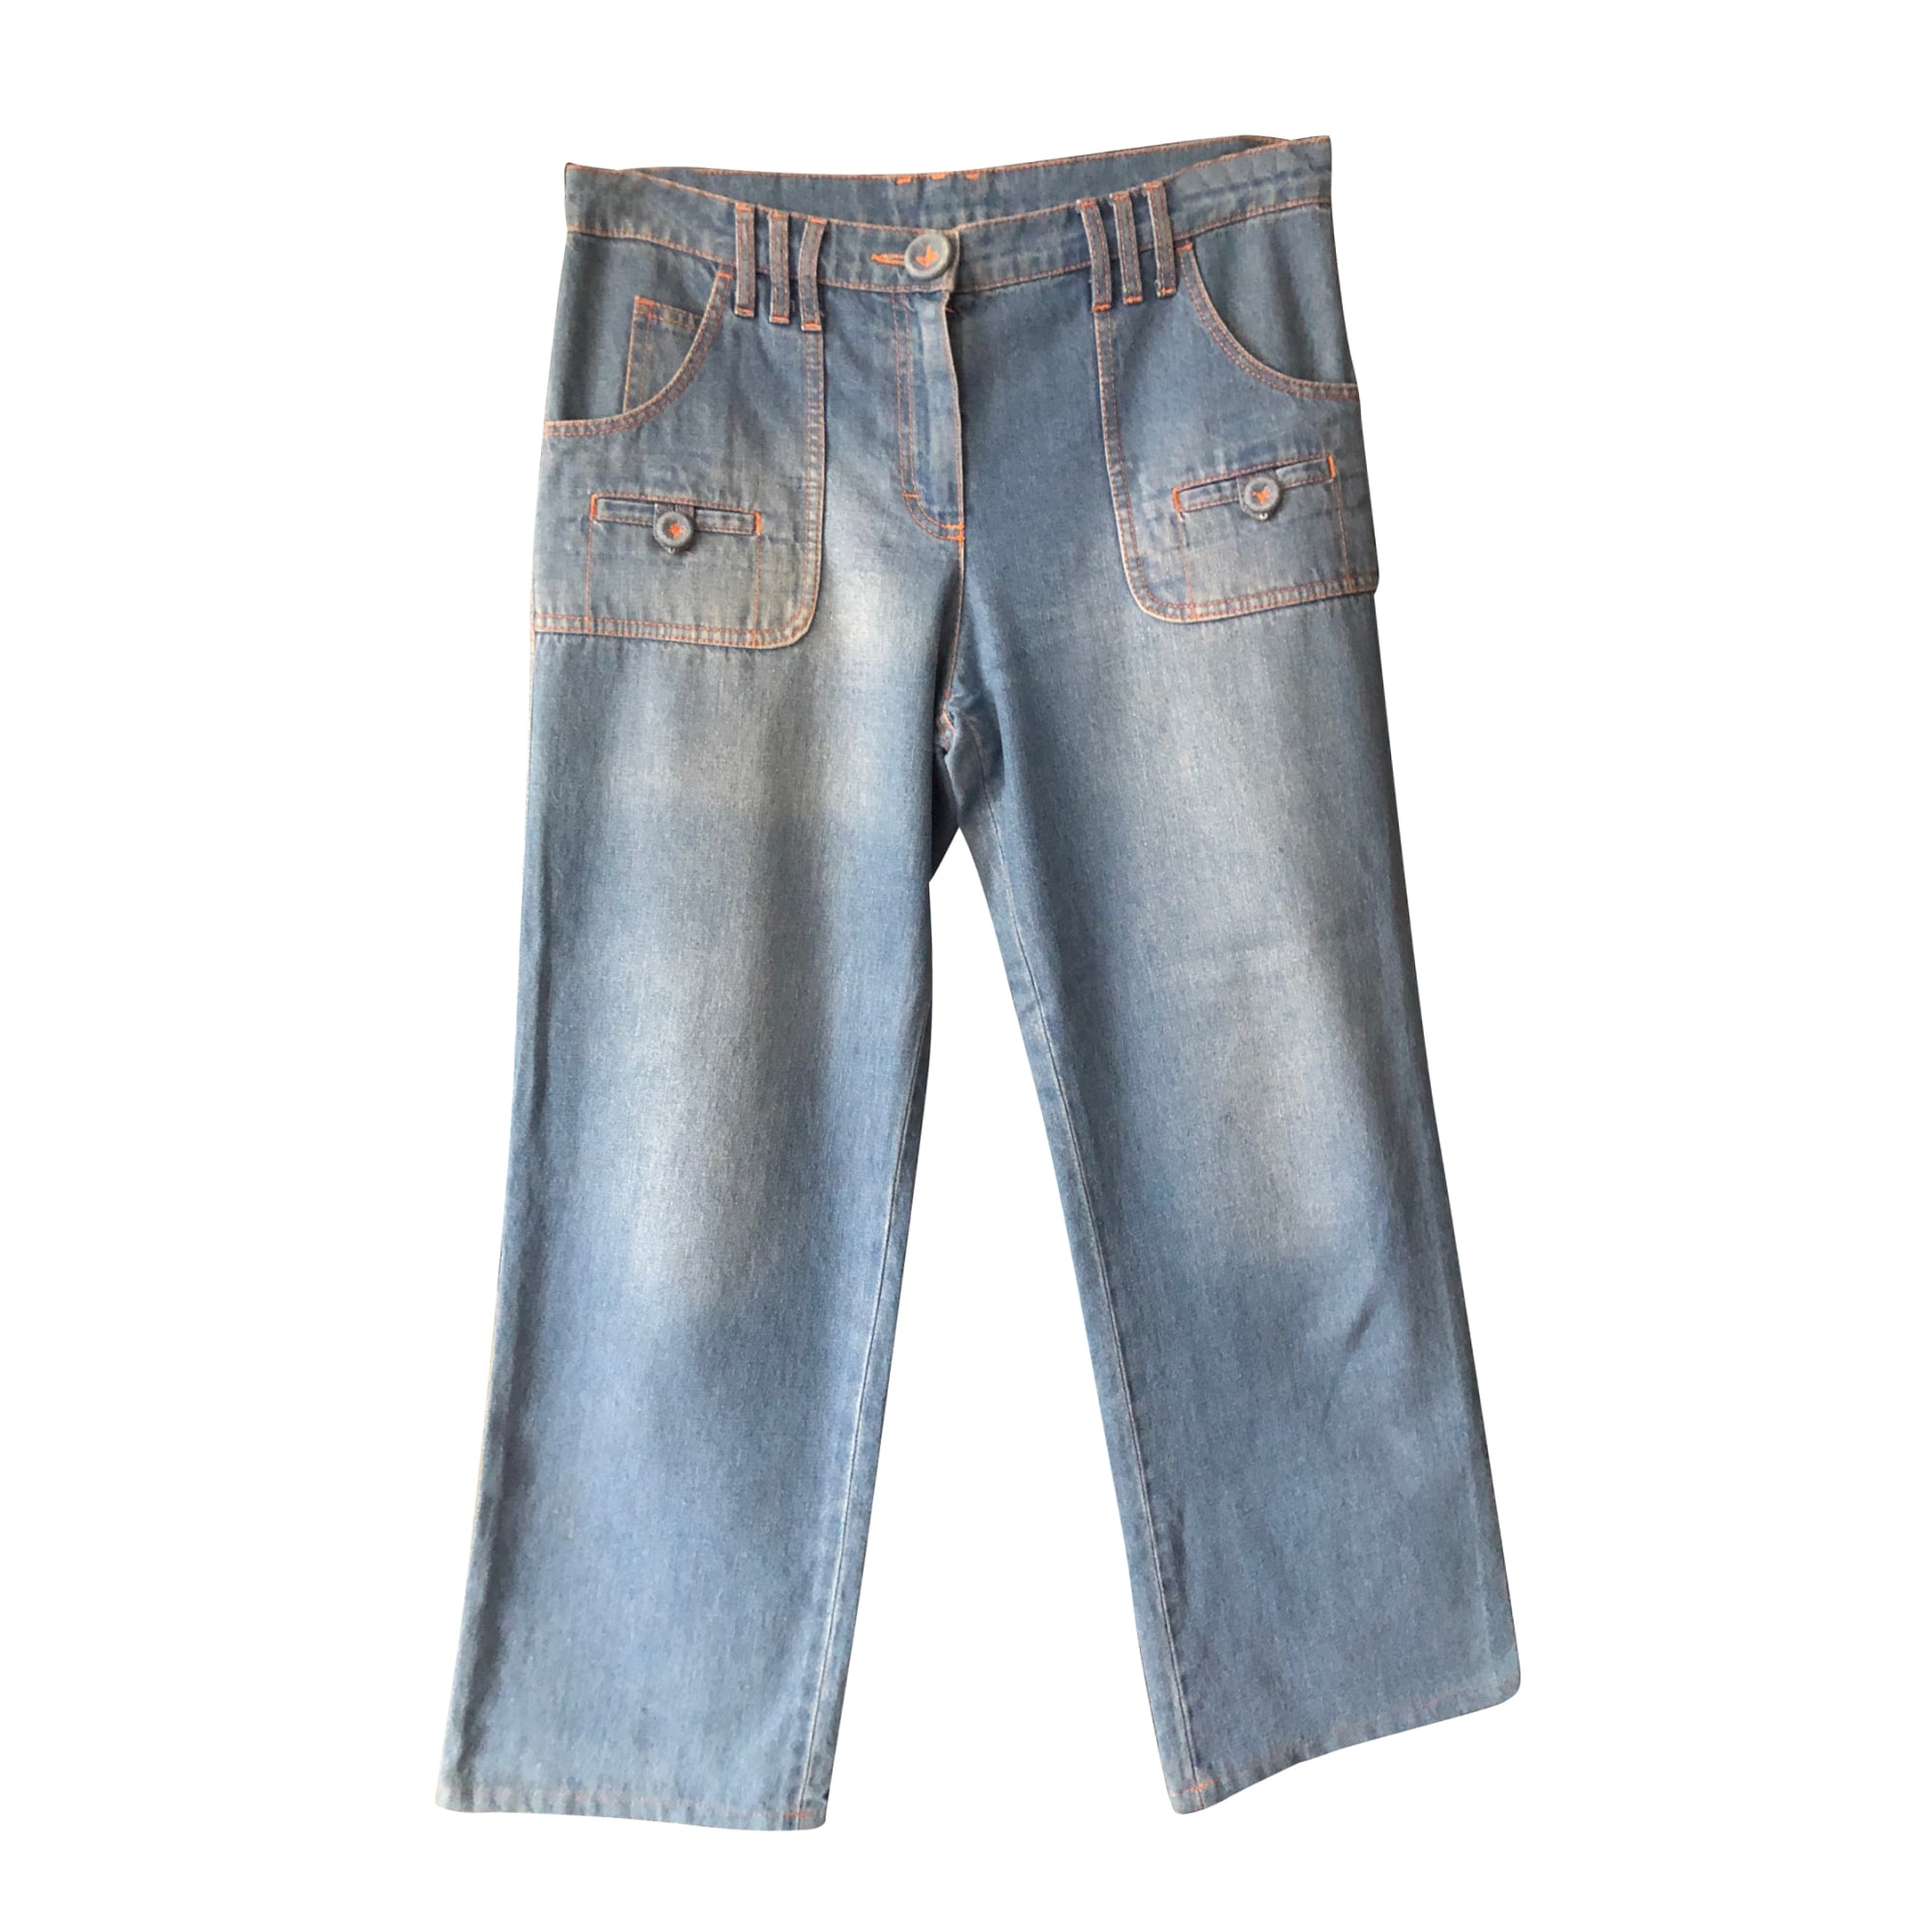 Pantalon droit SONIA RYKIEL Bleu, bleu marine, bleu turquoise